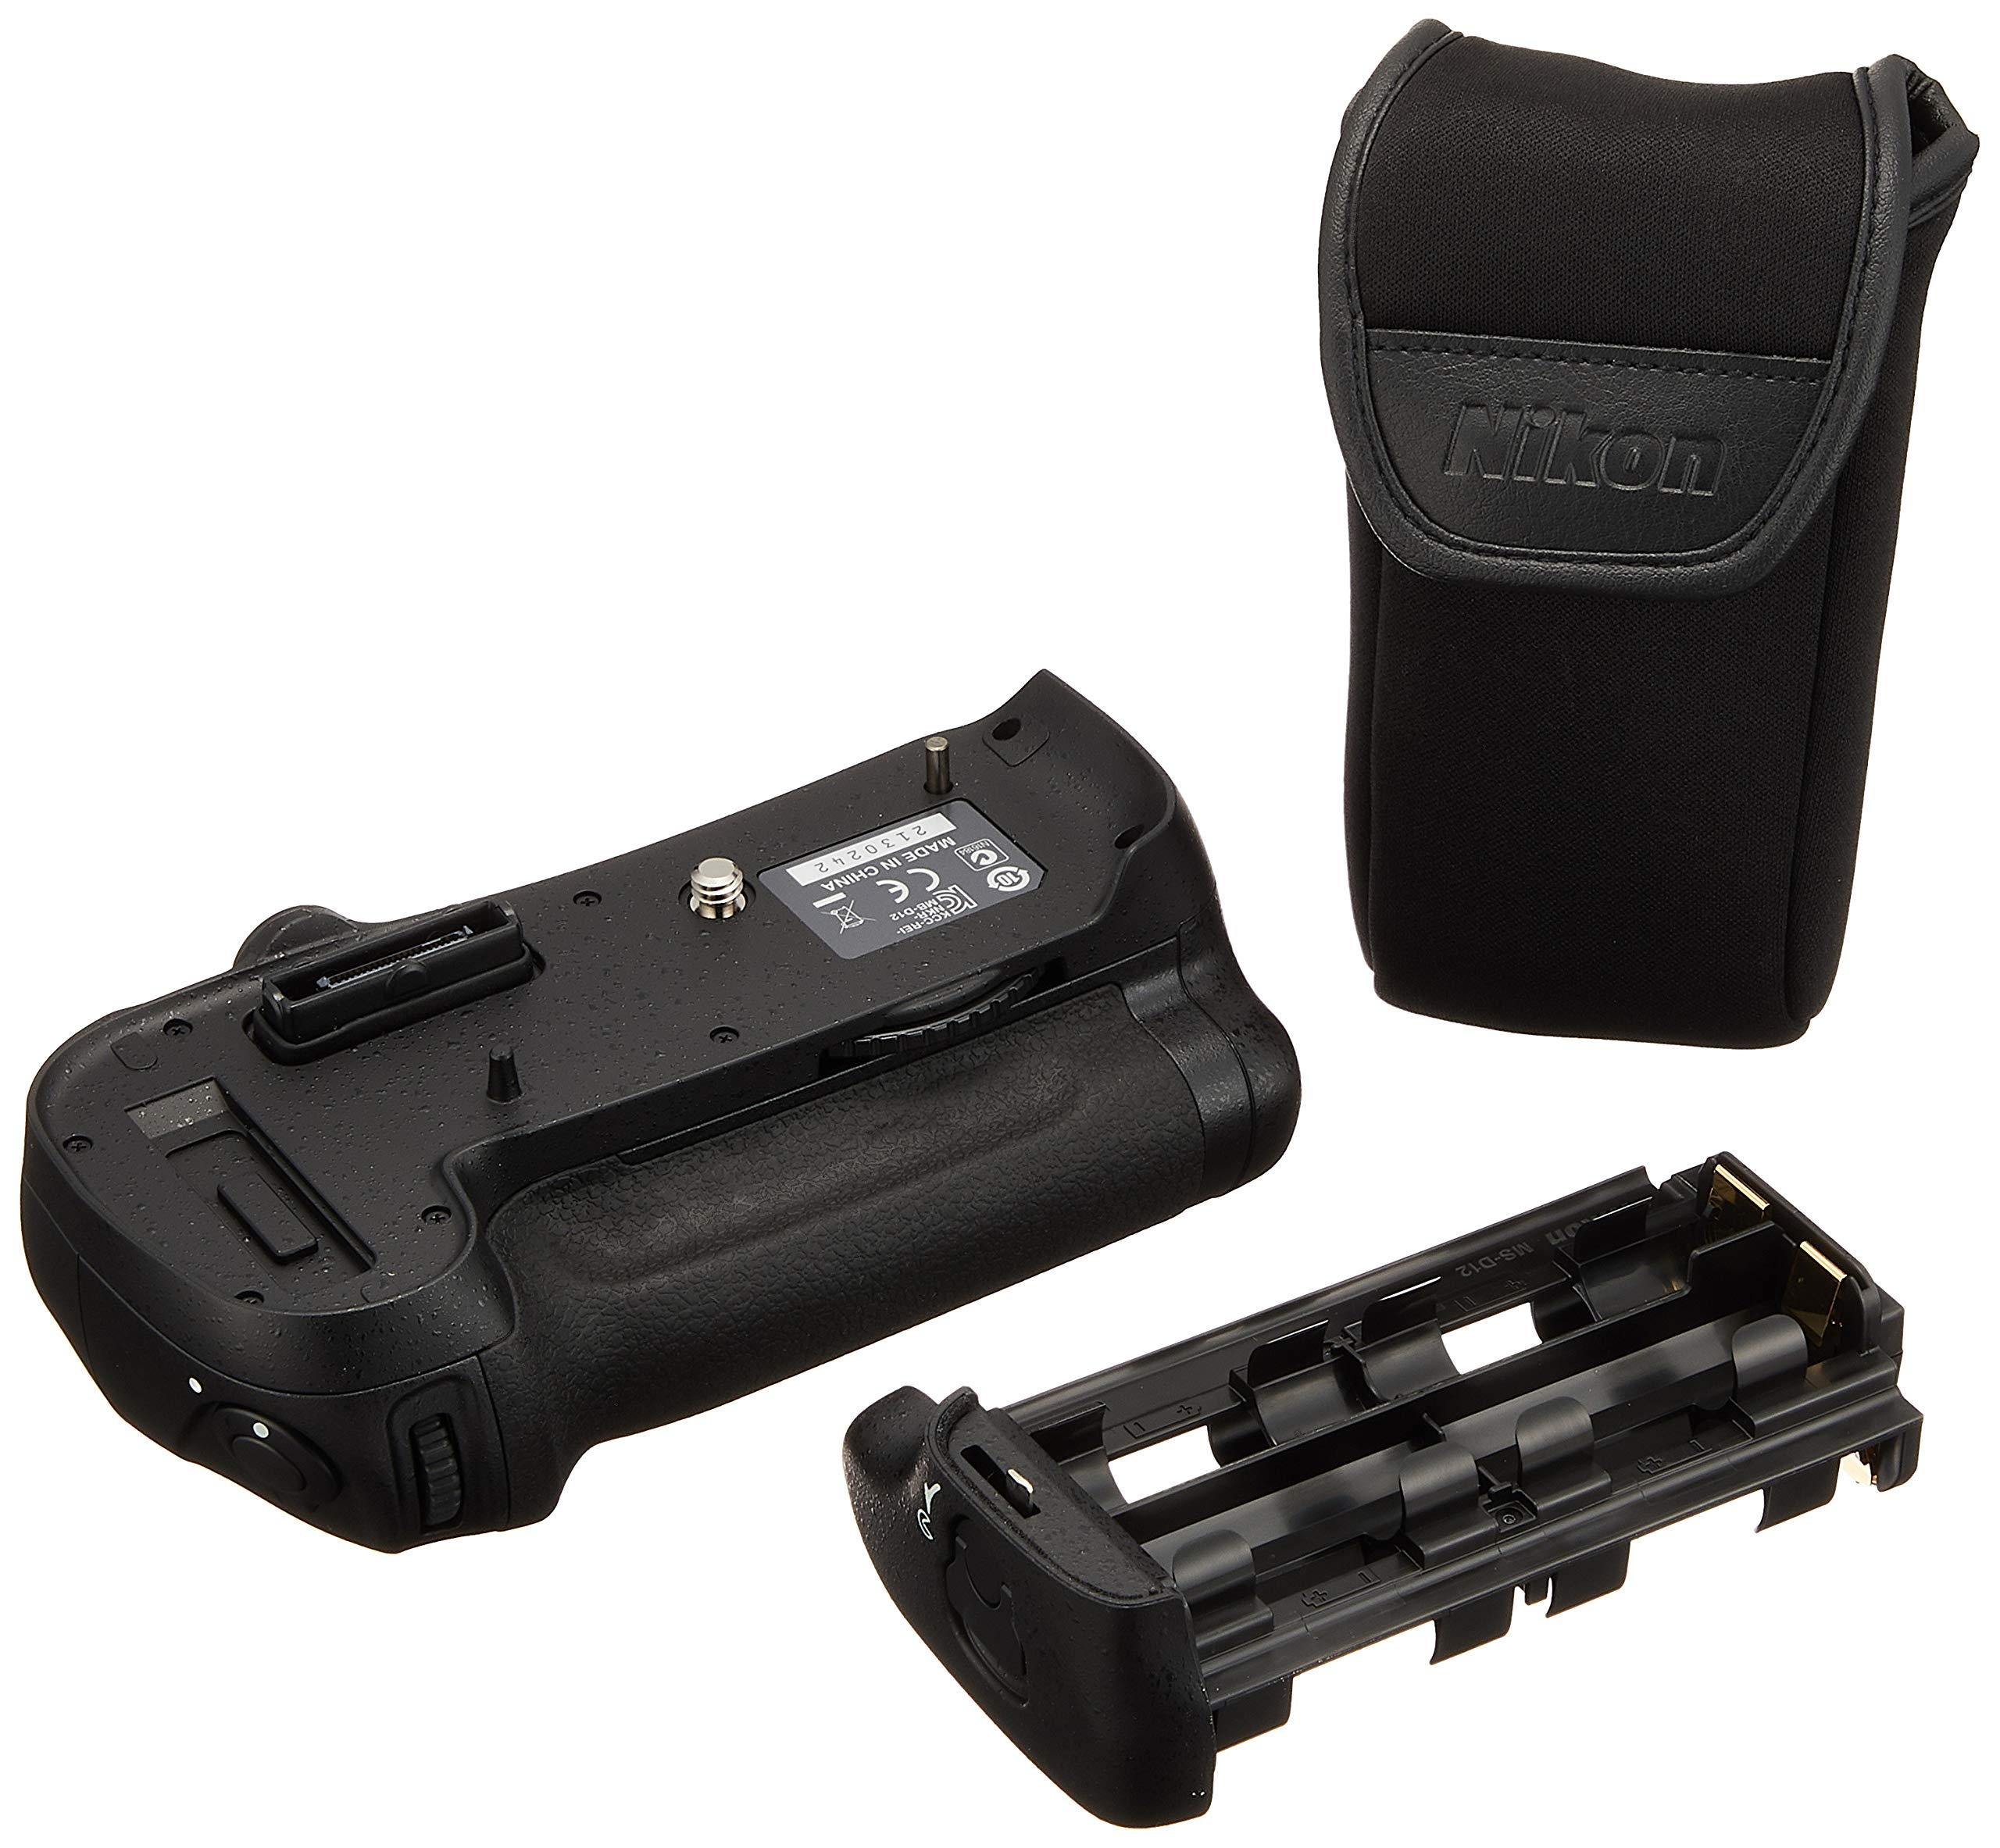 Nikon MB-D12 Multi Battery Power Pack by Nikon